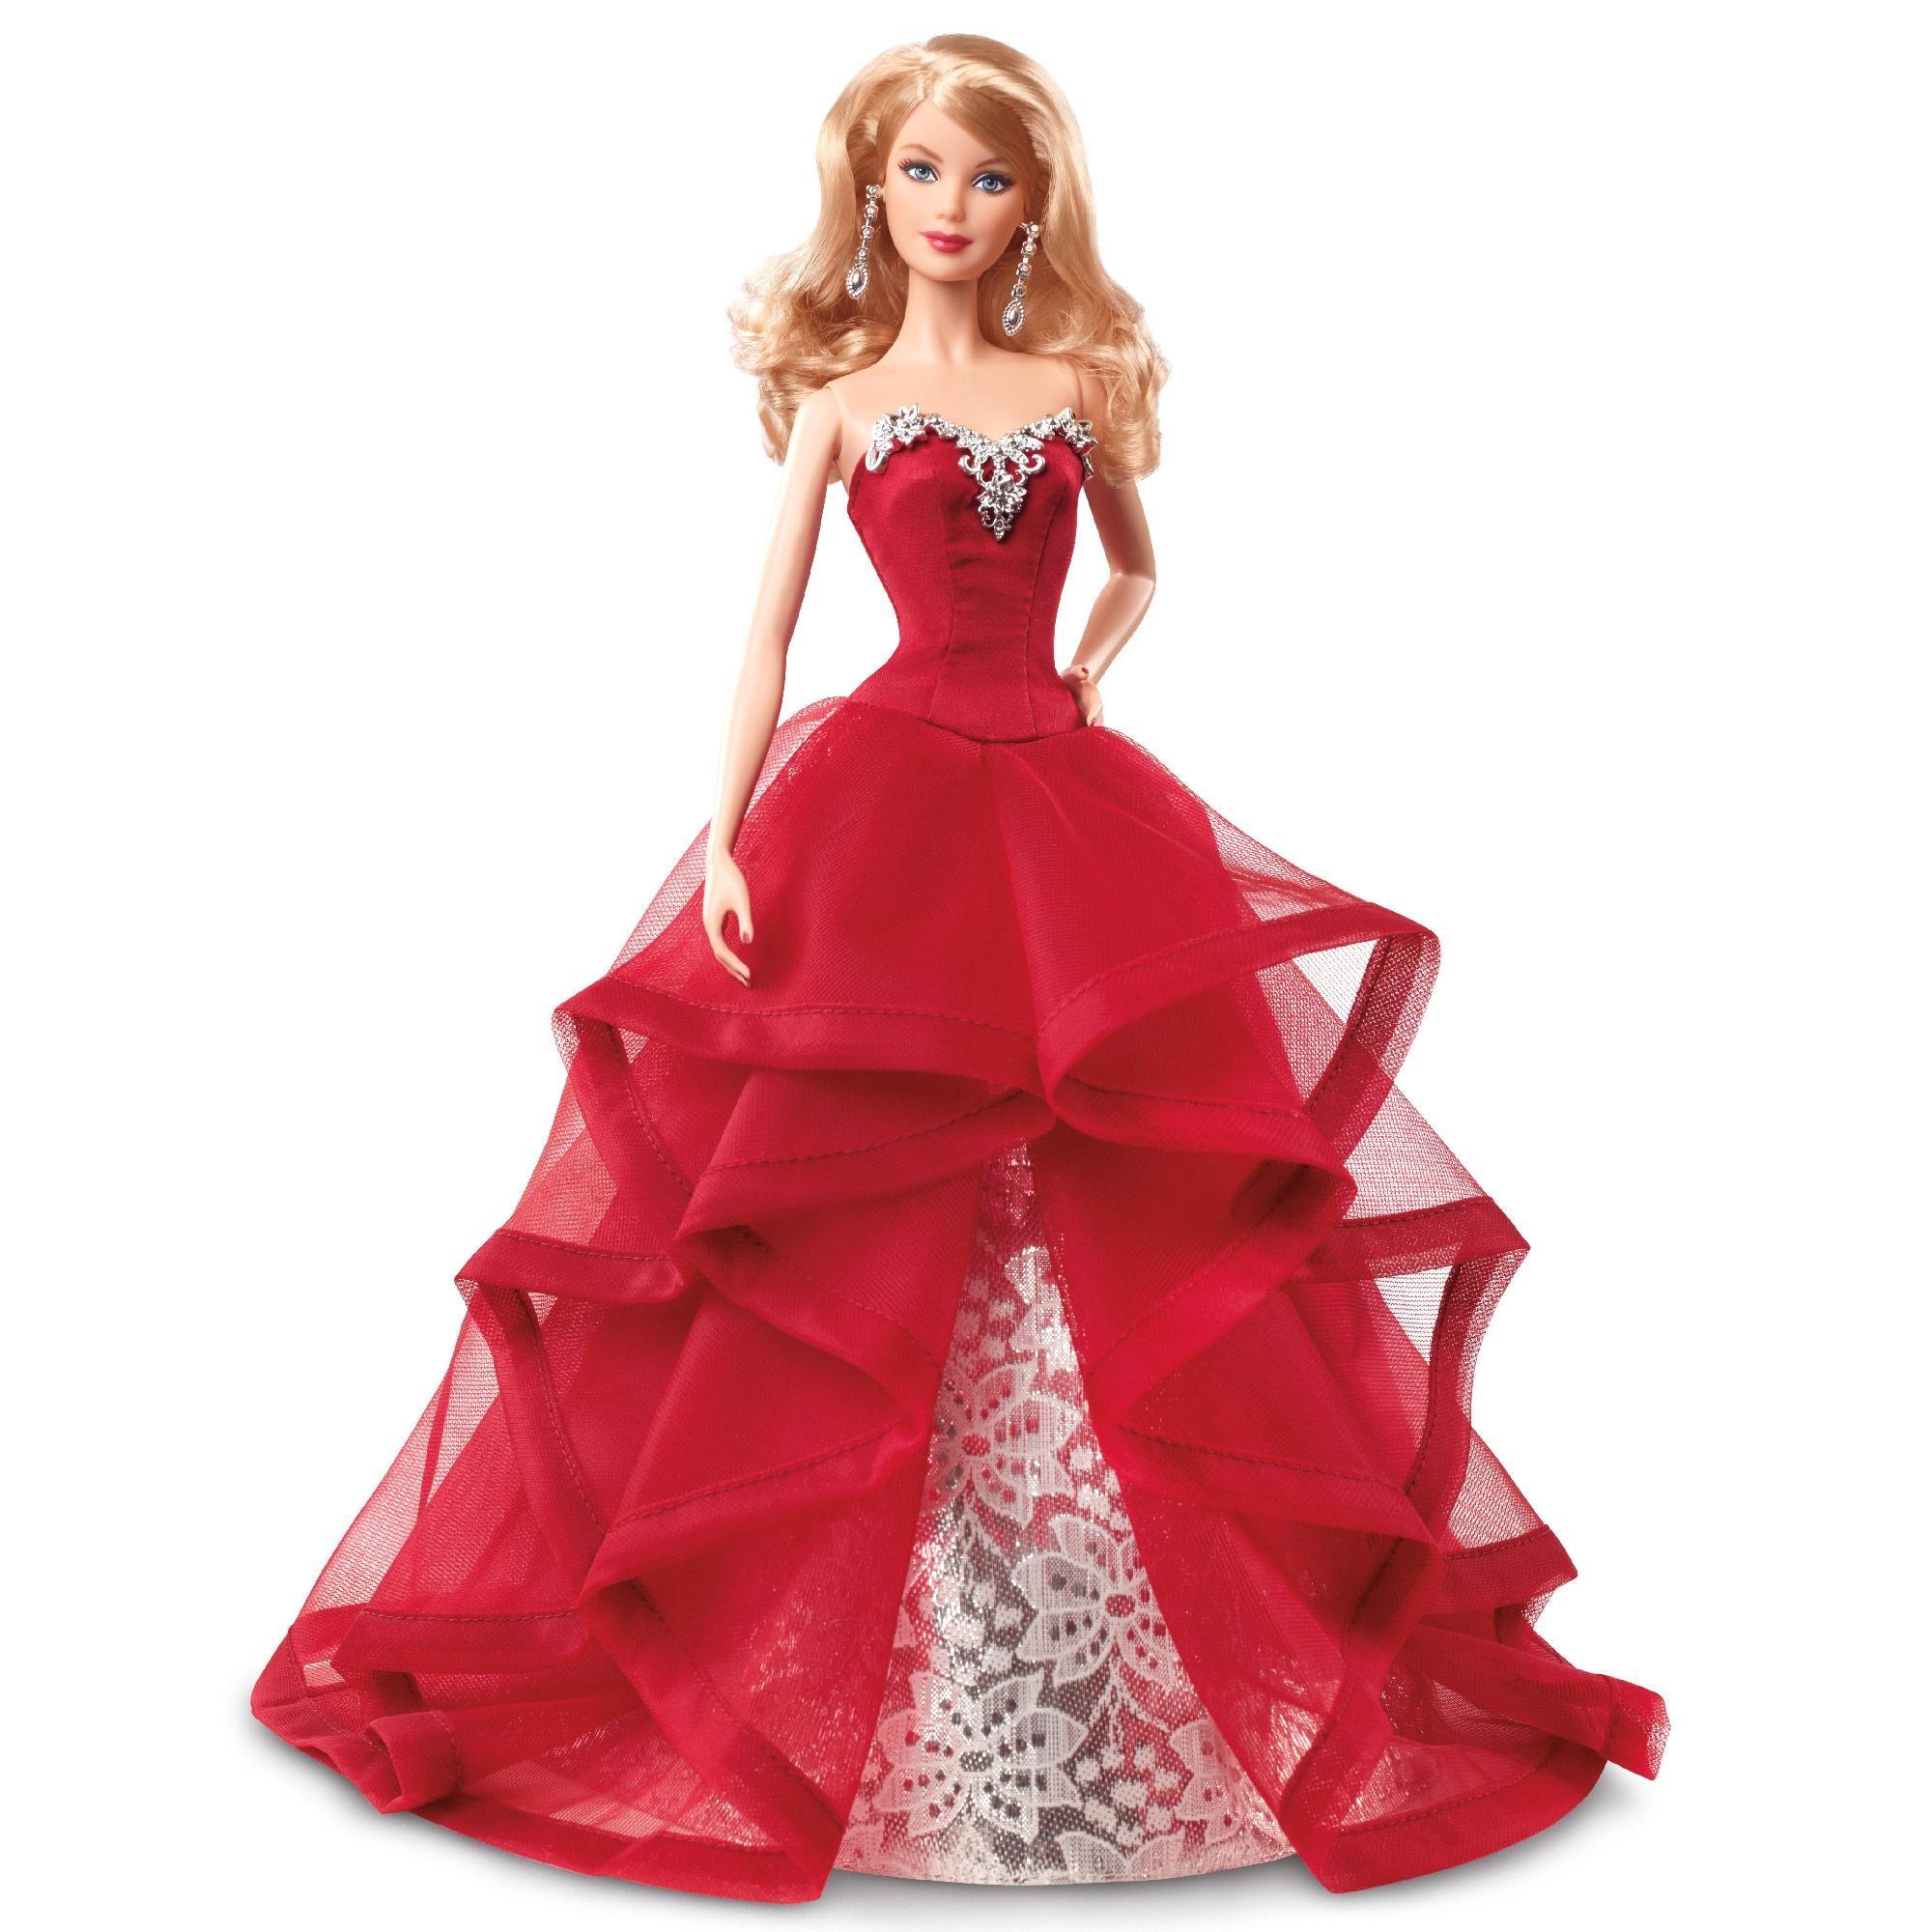 Barbie Lady In Red -Cartoon for children -Best Kids Games ...